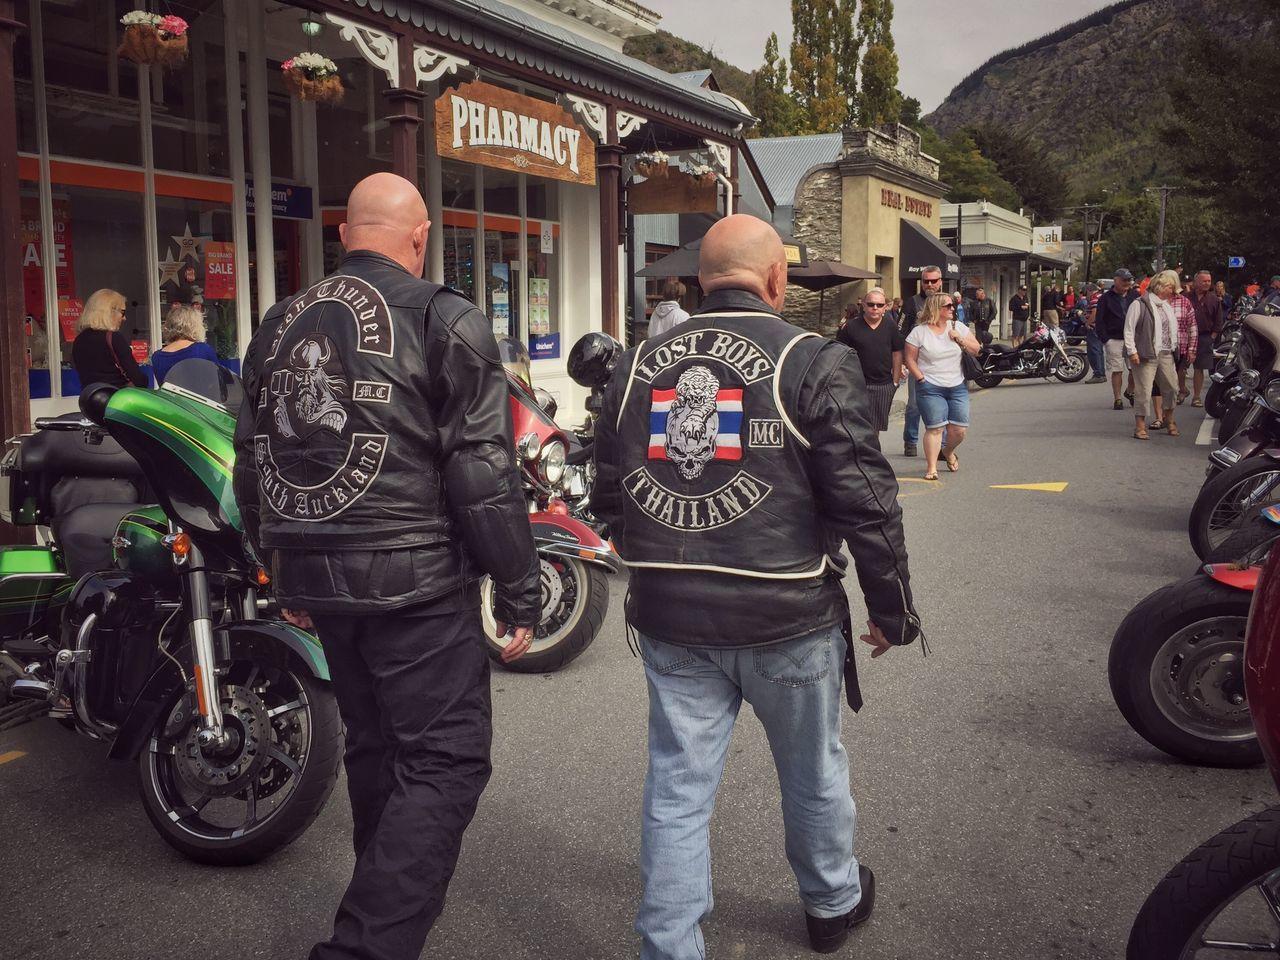 Bikers Brotherhood Men Street HarleyDavidsonMotorcycles Gang Leather Jacket Patches Motorcycles